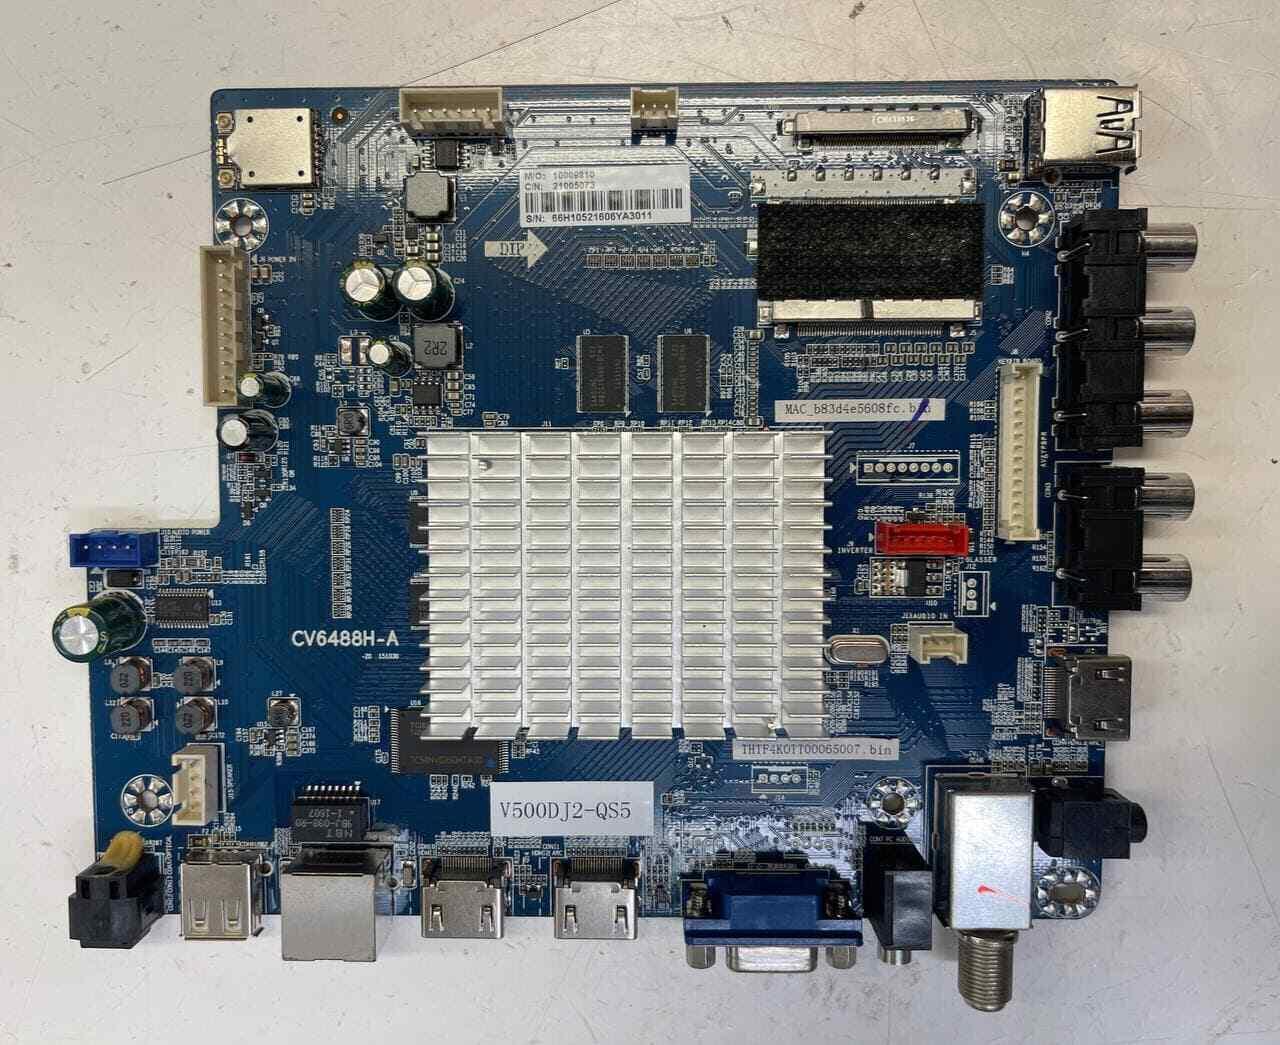 V500DJ2-QS5 CV6488H-A Westinghouse Main Board For WD50UT4490 TW-04511-C050G - $25.00